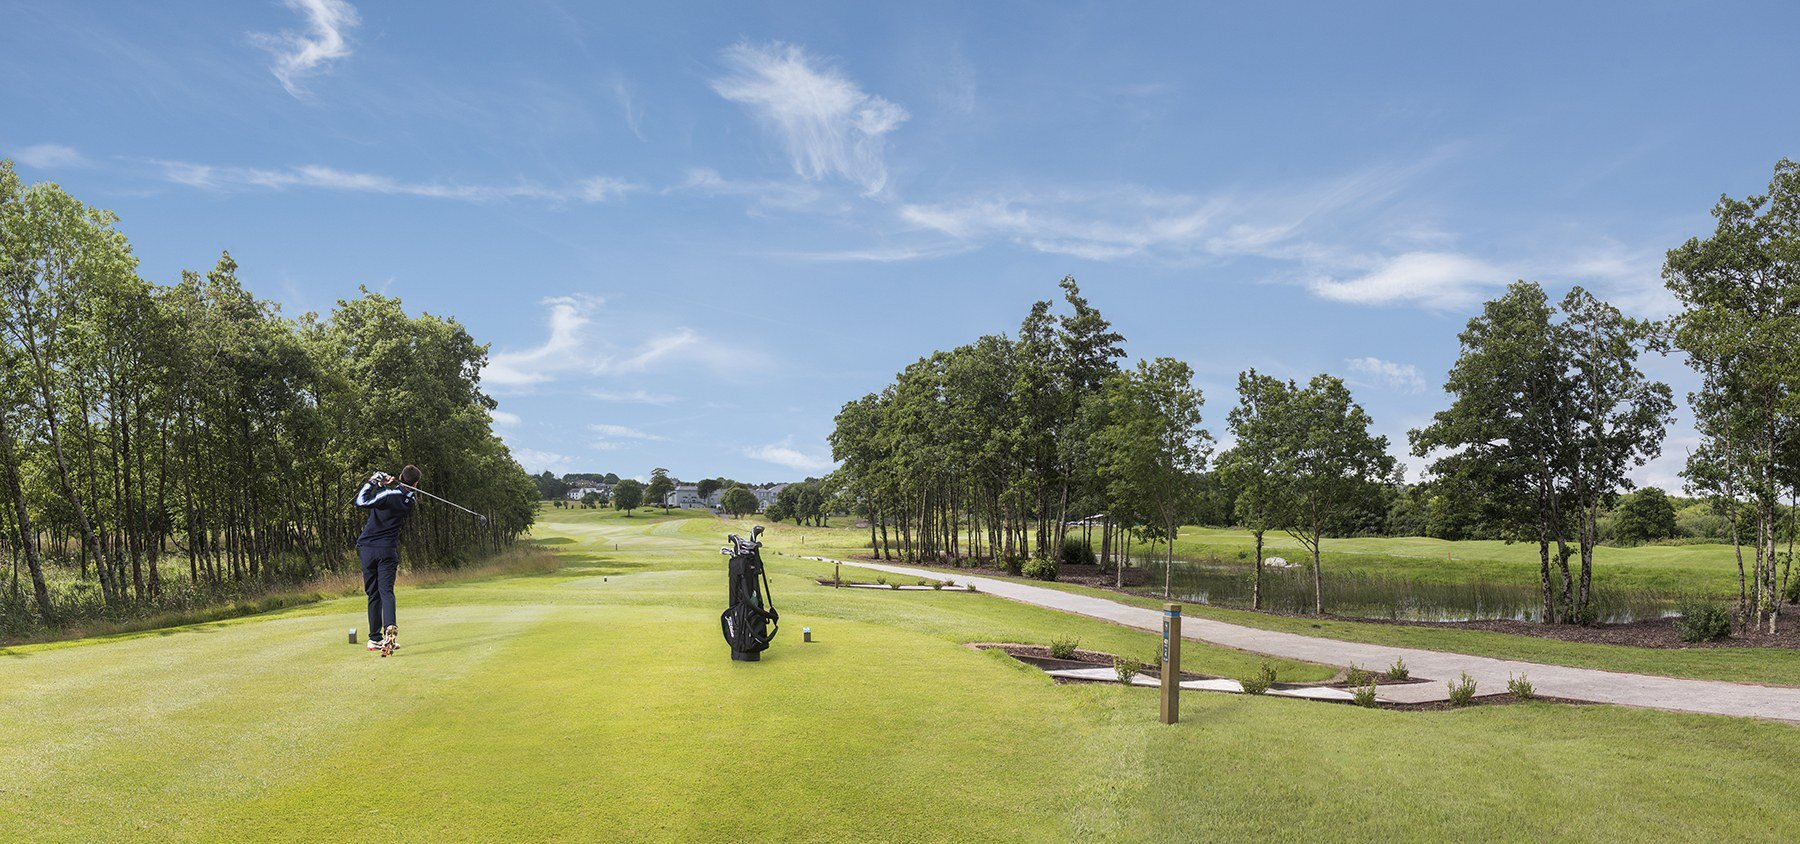 Glenlo Abbey Golf Resort in Galway - Visit Galway